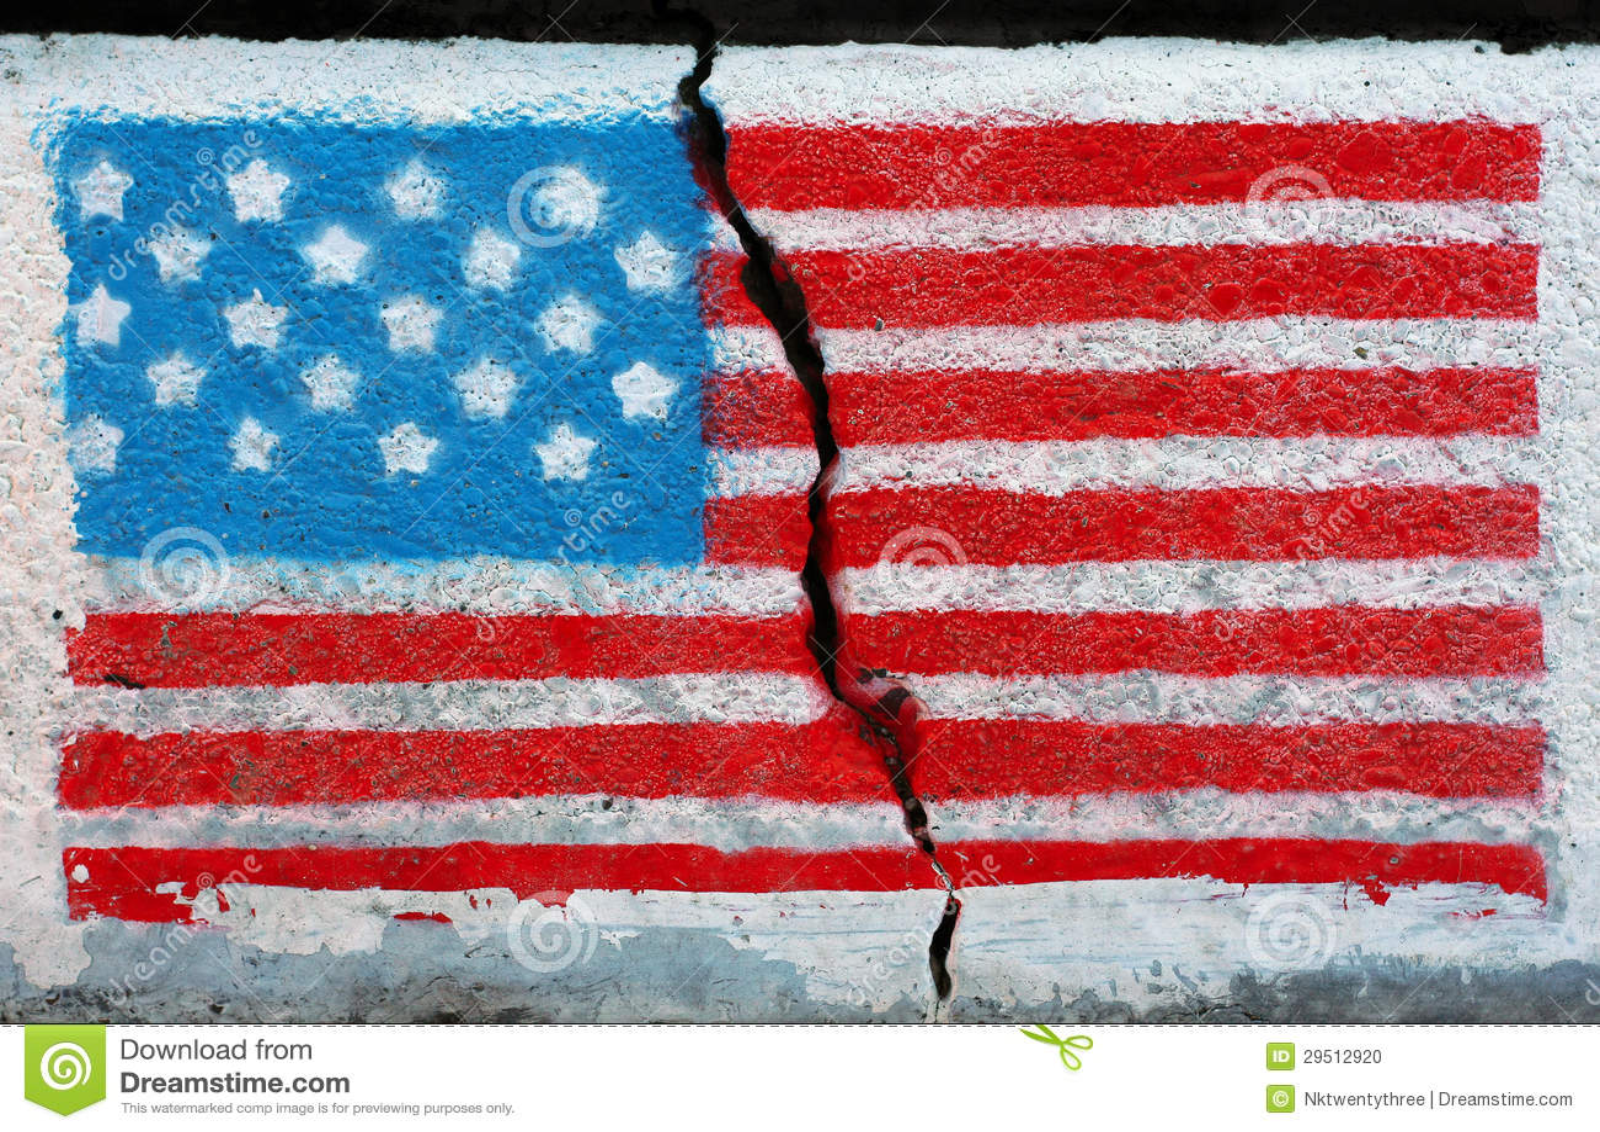 Graffiti wall usa - American Flag On A Cracked Wall Stock Photo